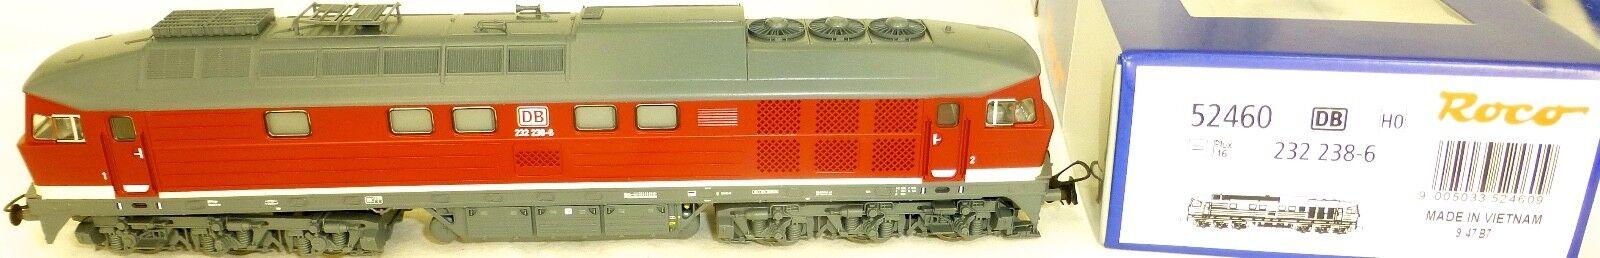 232 238-6 Diesellok DB EpV PluX16 Roco 52460 H0 1 87 OVP NEU KB4 µ